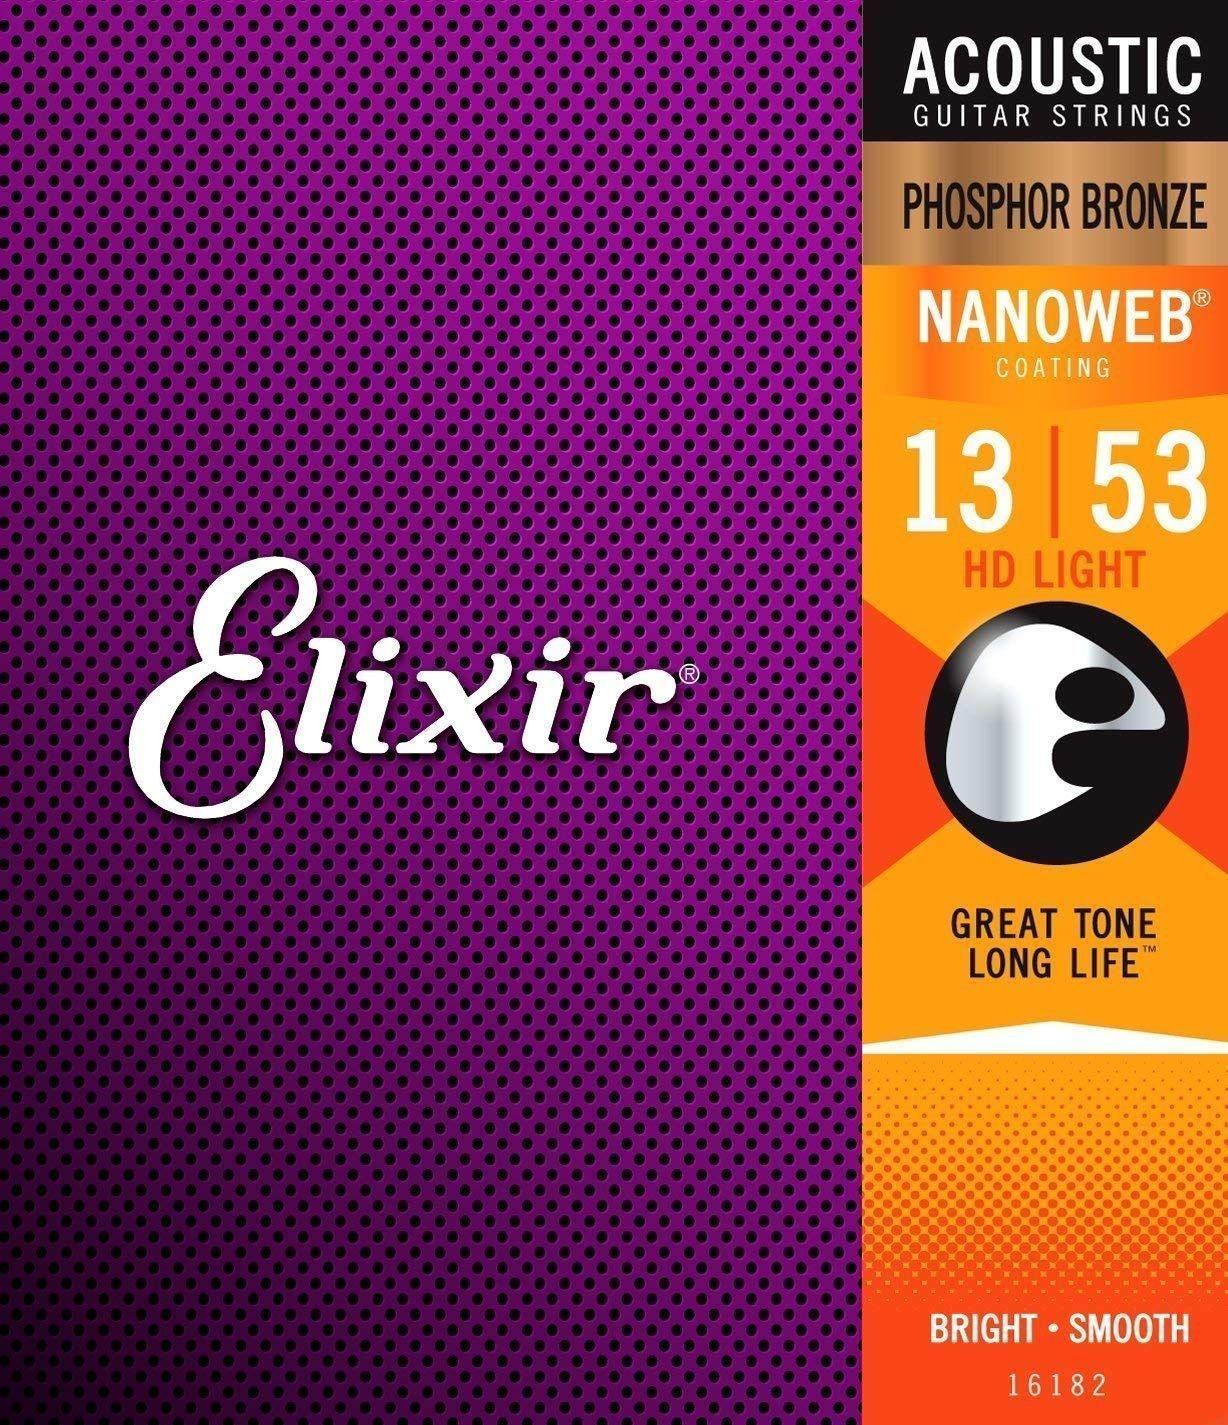 Elixir 16182 HD LIGHT Phosphor Bronze NanoWeb Coated 13-53